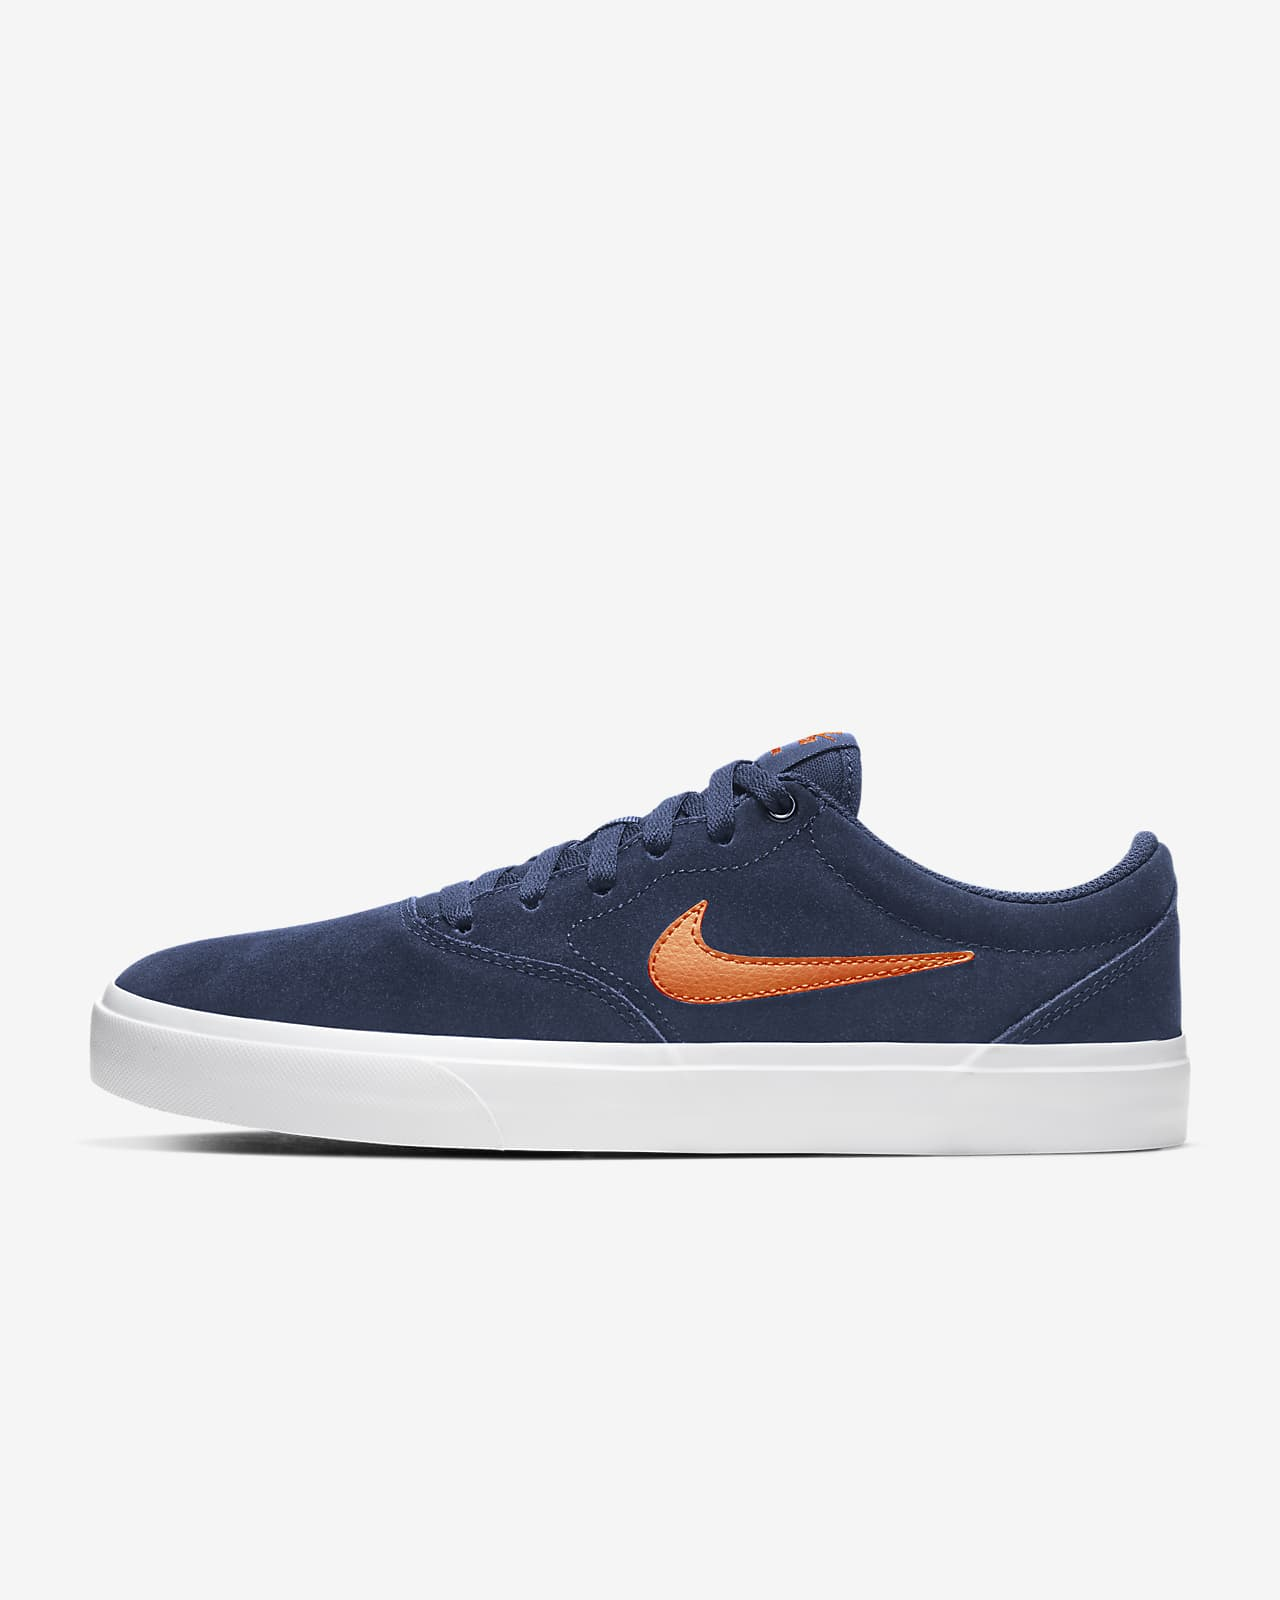 Nike SB Charge Suede 男/女滑板鞋